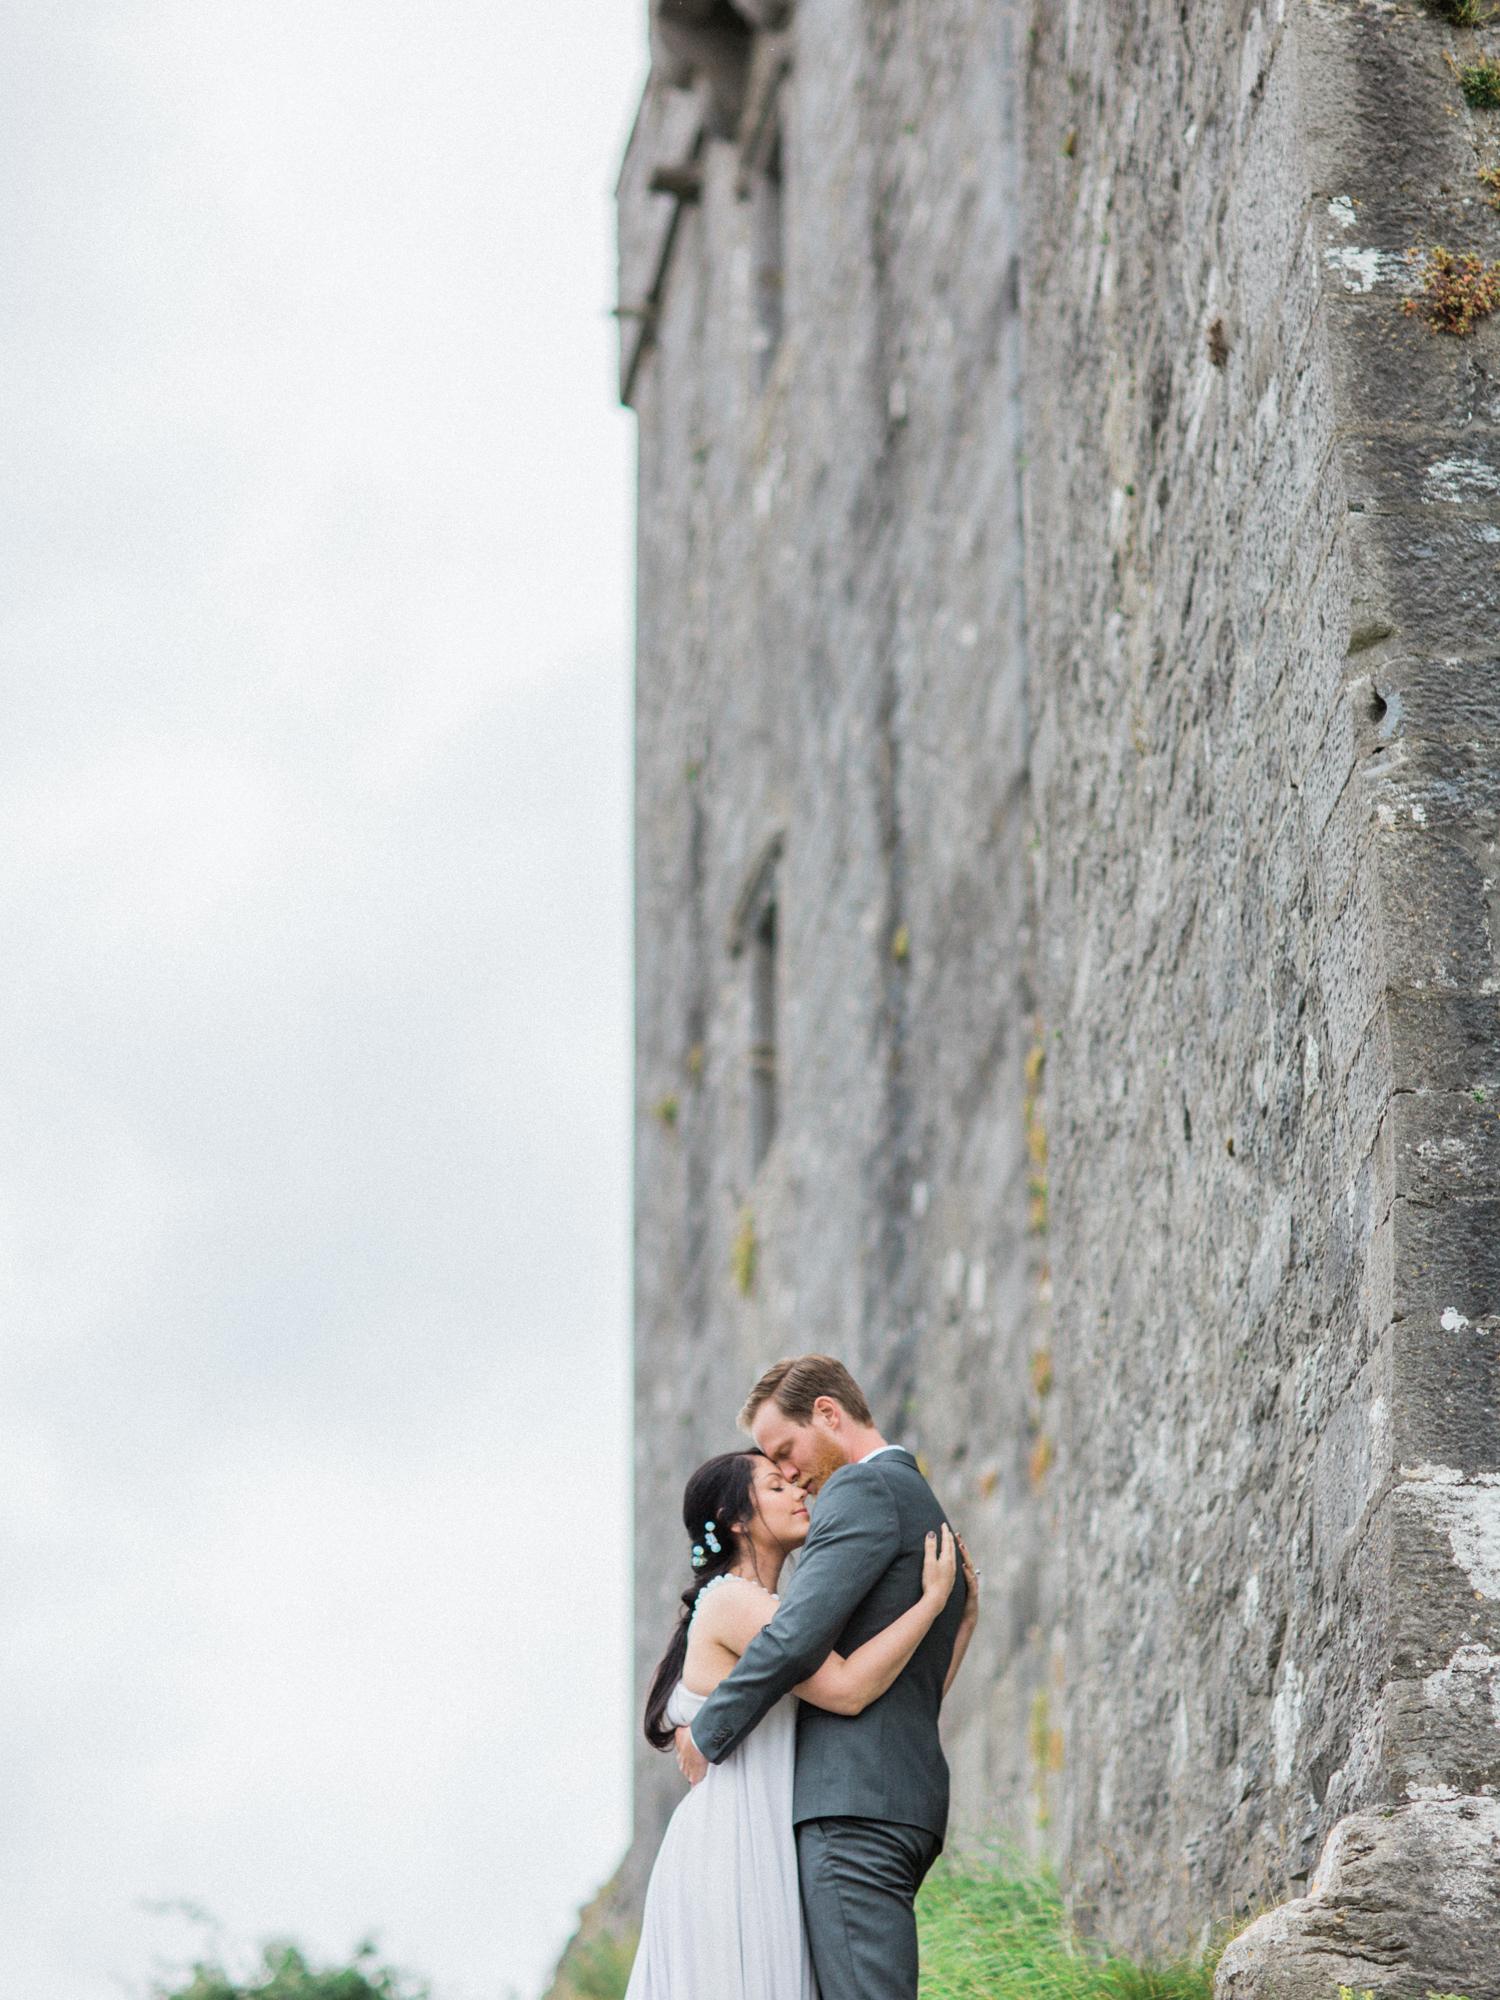 DanielleGirouxPhotography_EuropeTrip0C6A1830.jpg